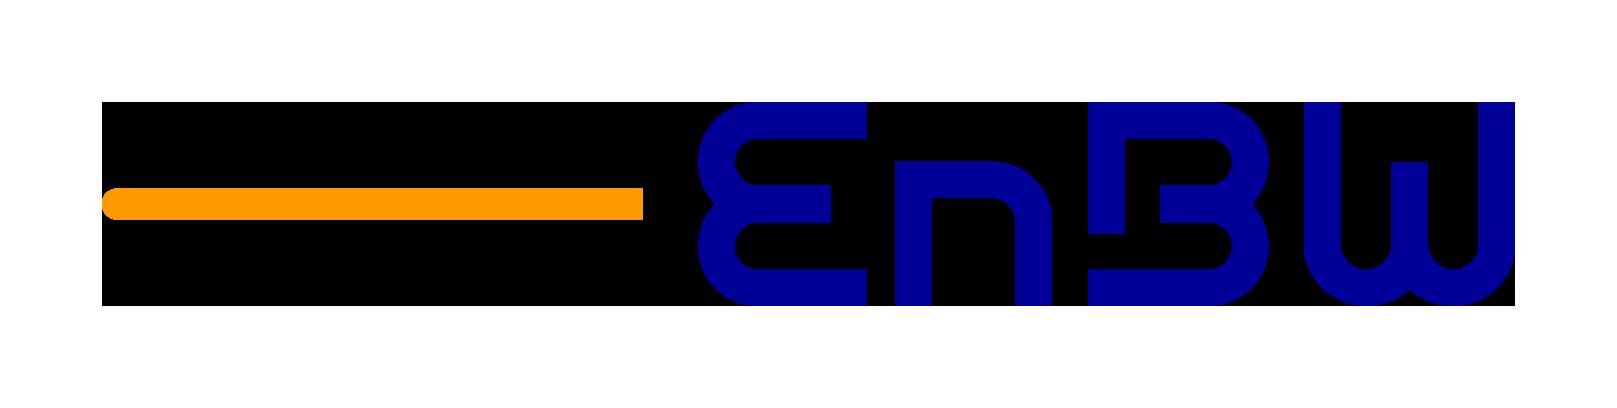 EnBW_Logo_BlauOrange_sRGB